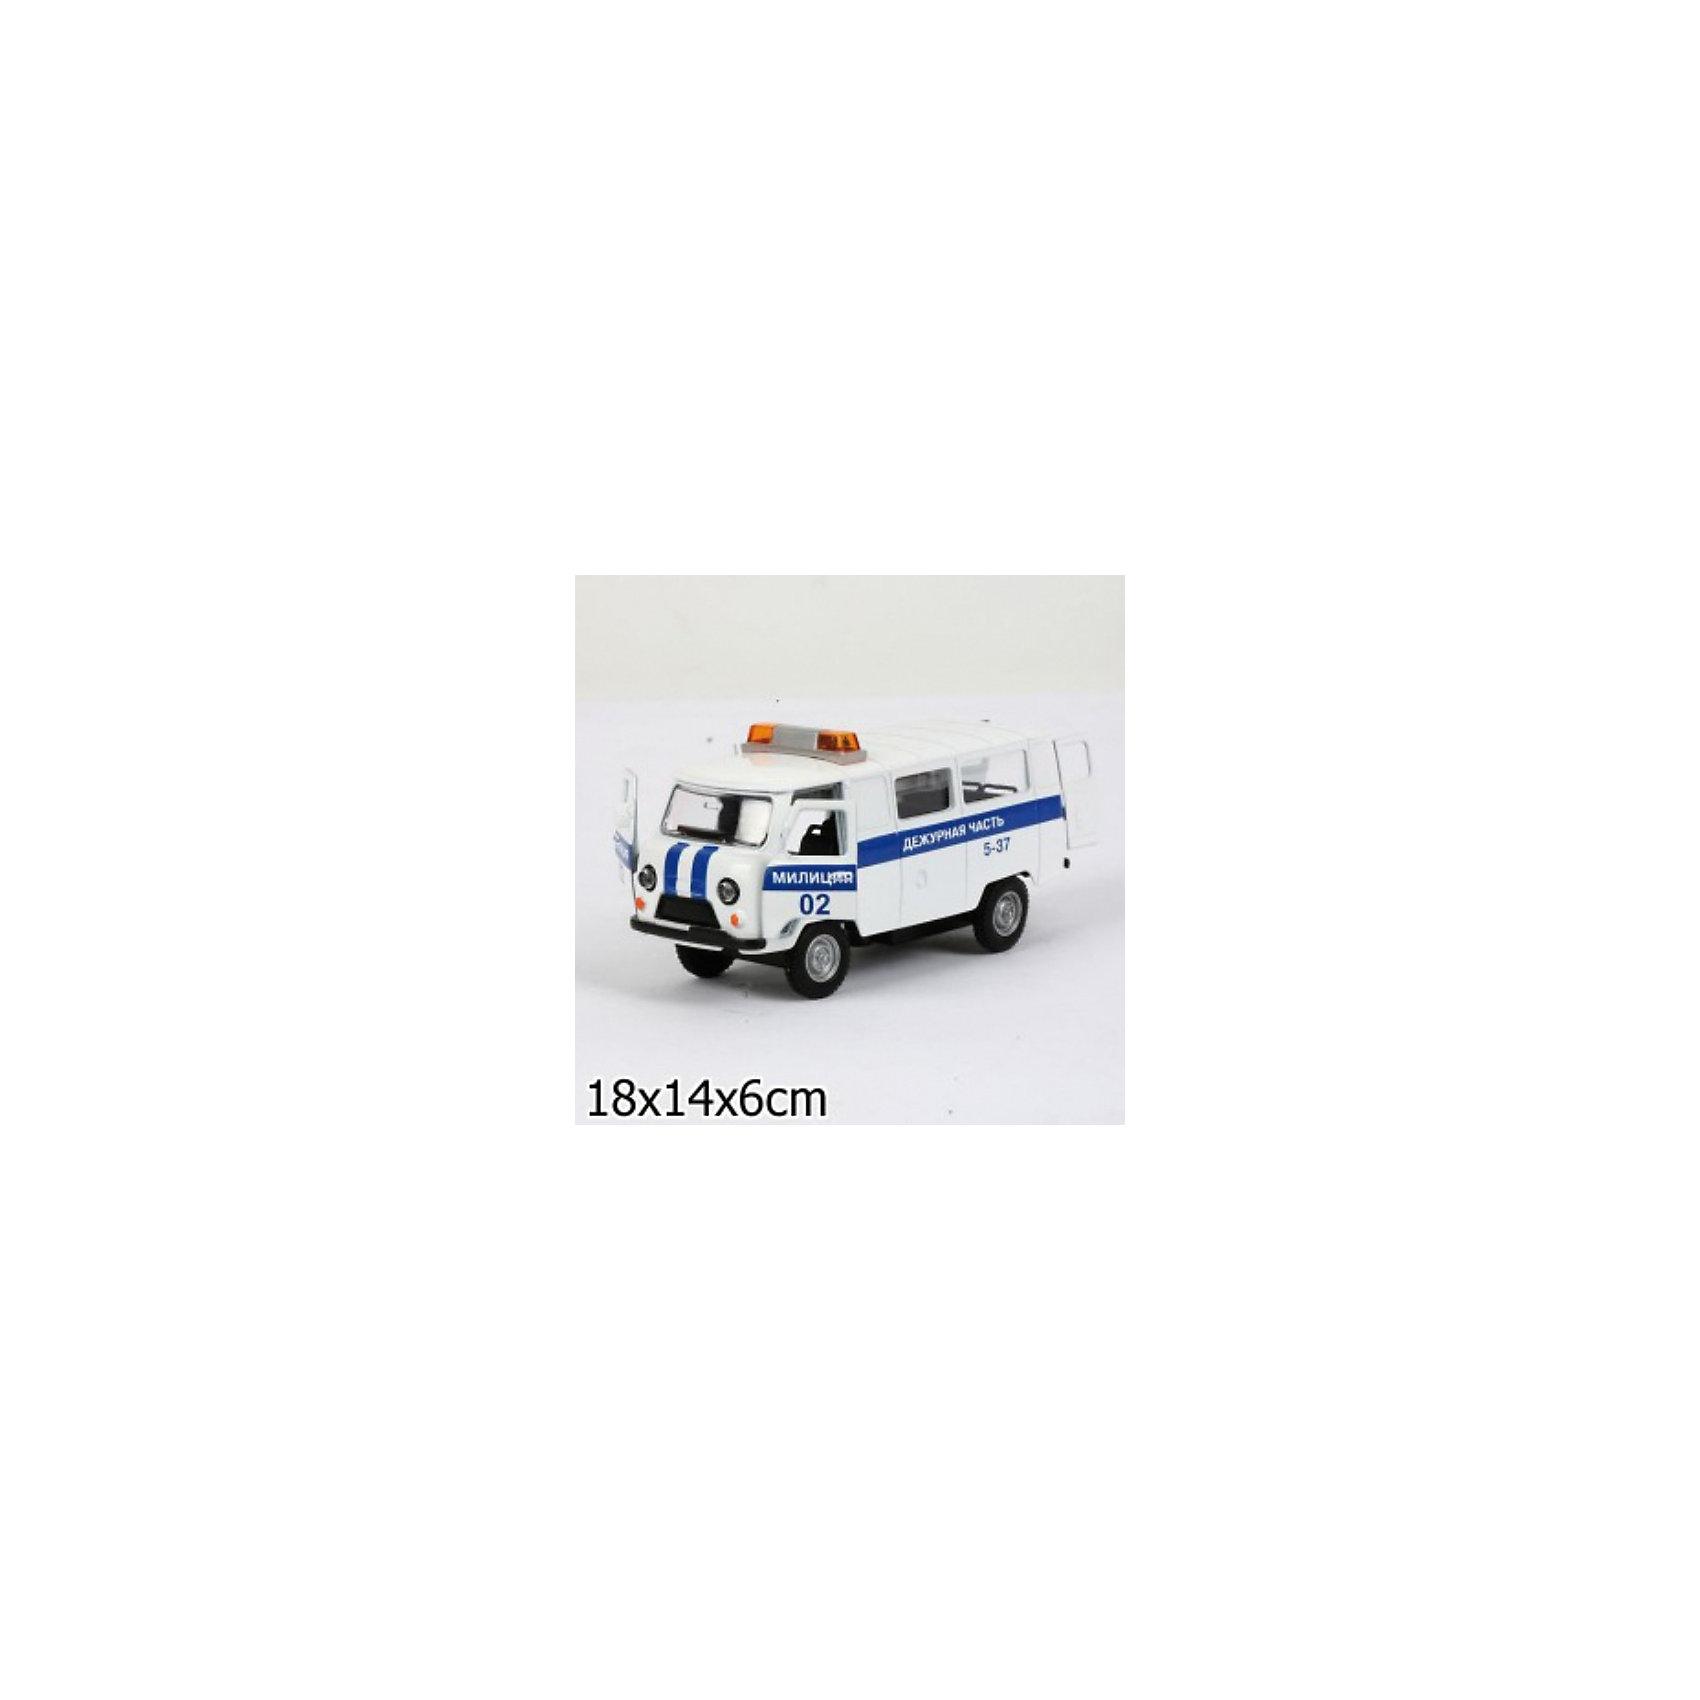 ТЕХНОПАРК ТЕХНОПАРК Машина милиции белая технопарк технопарк набор милиция со светофором и фигурками